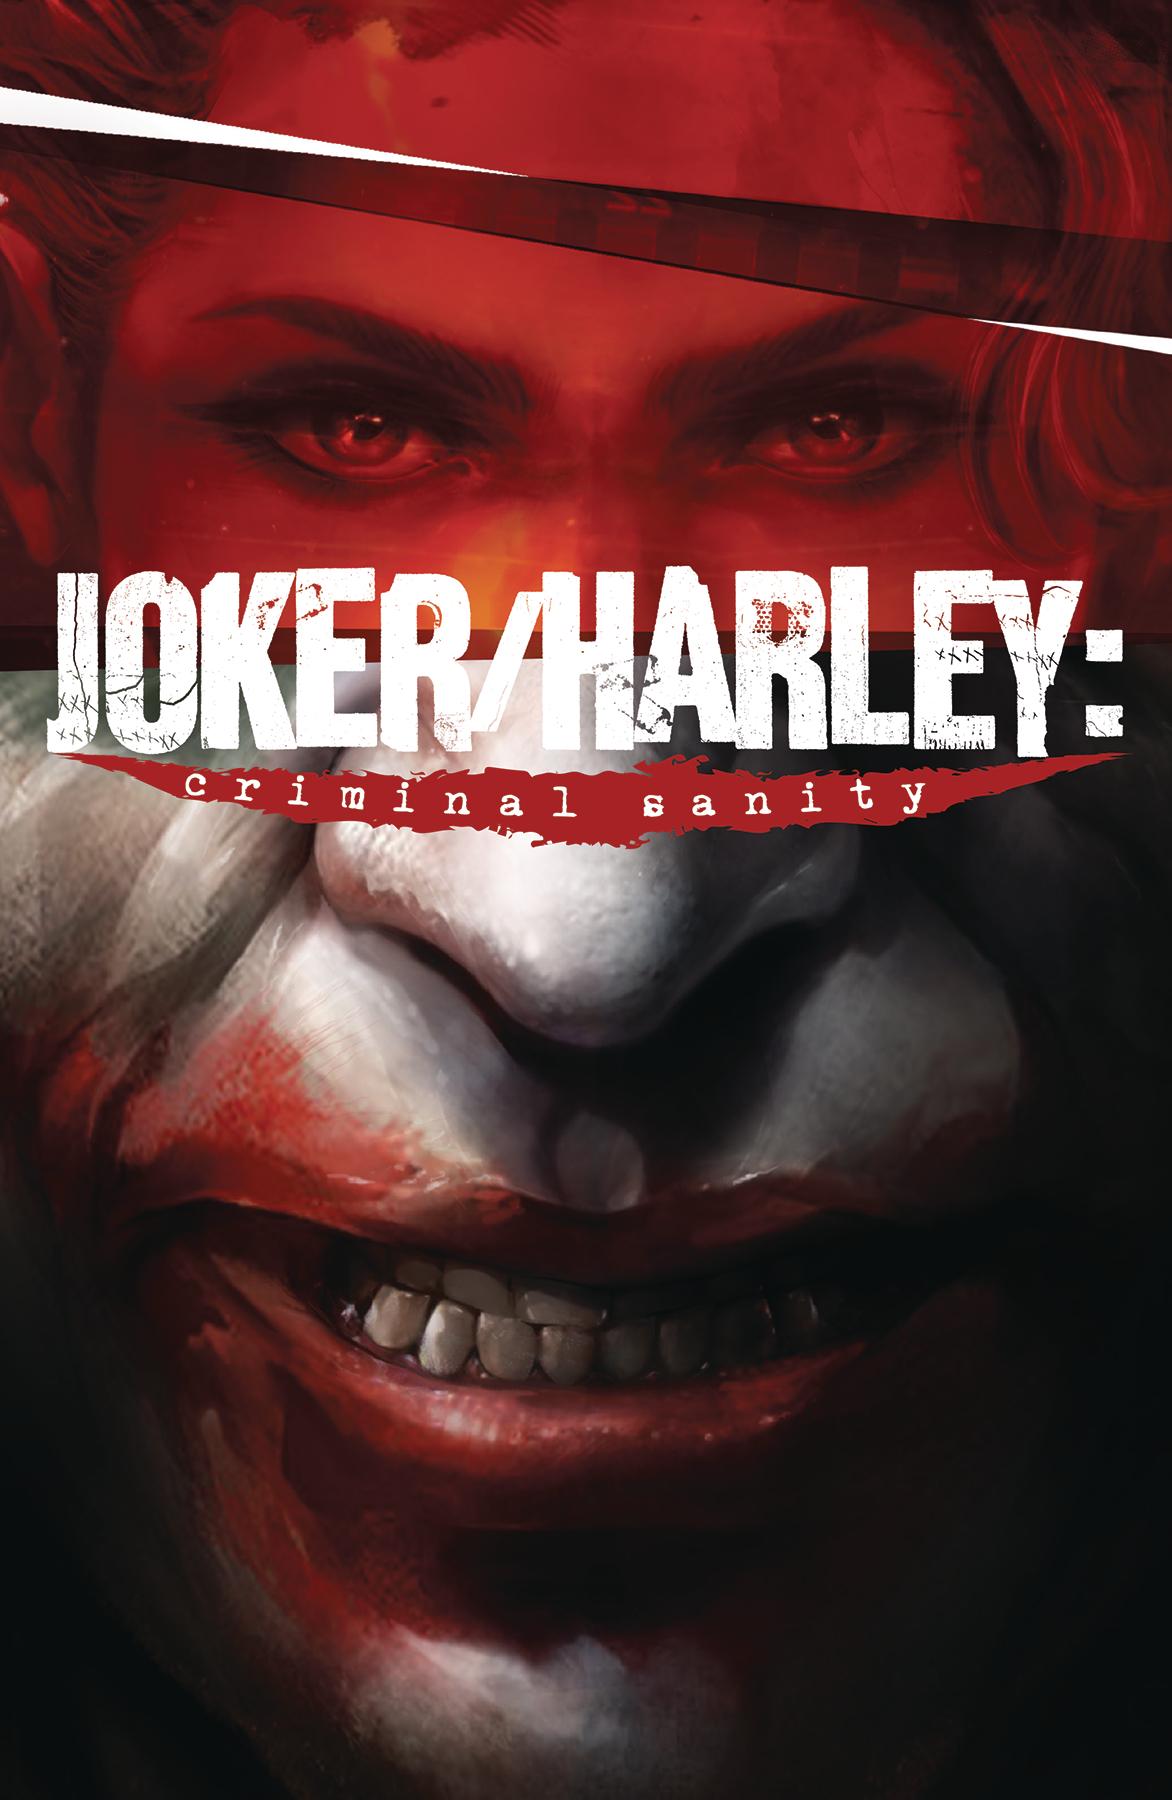 Joker/Harley Quinn: Criminal Sanity #2 Slips to December, Frank Cho's Poster Portfolio Arrived Two Months Early